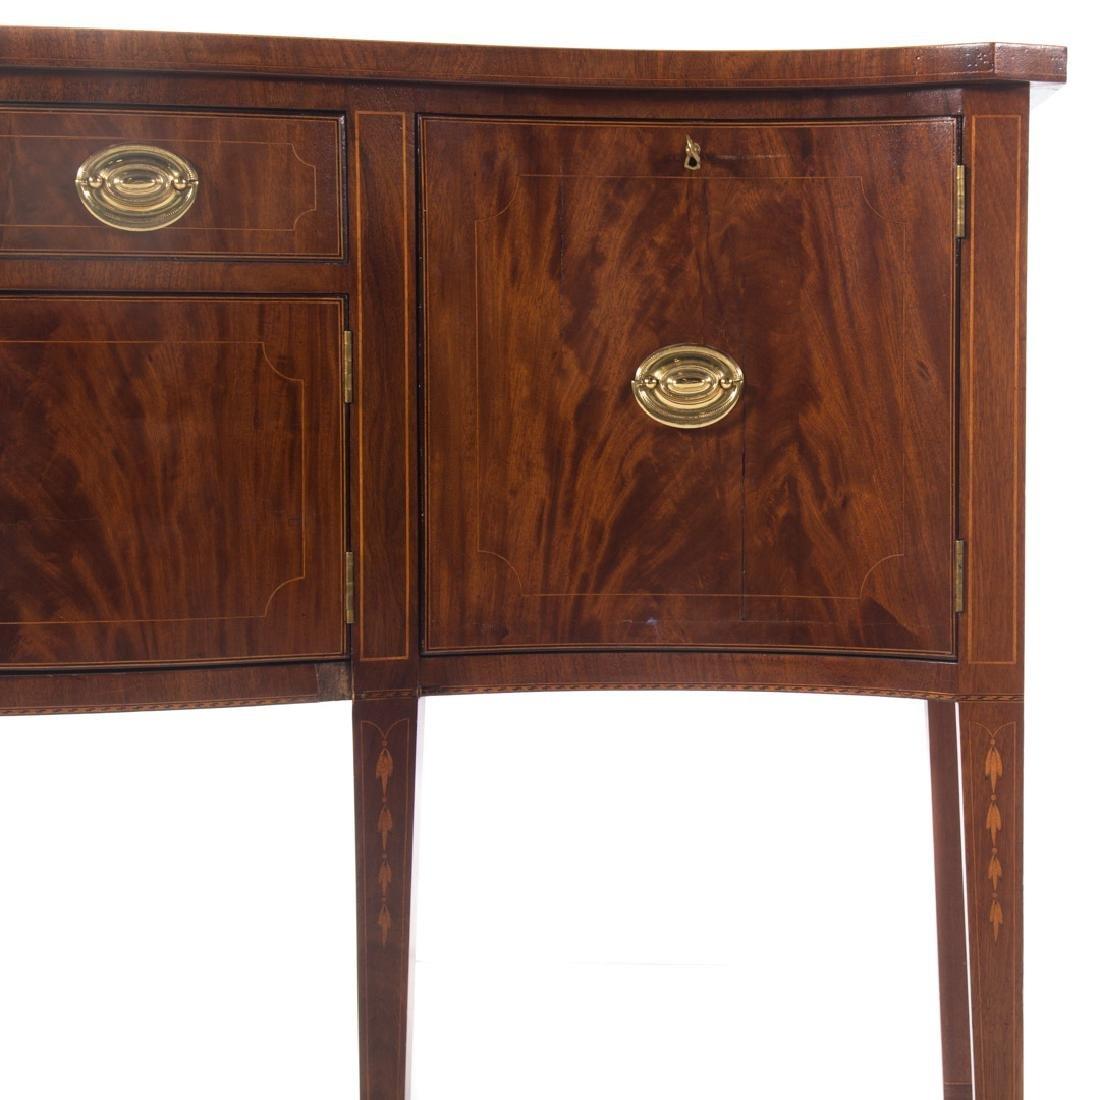 Centennial Federal style inlaid mahogany sideboard - 2